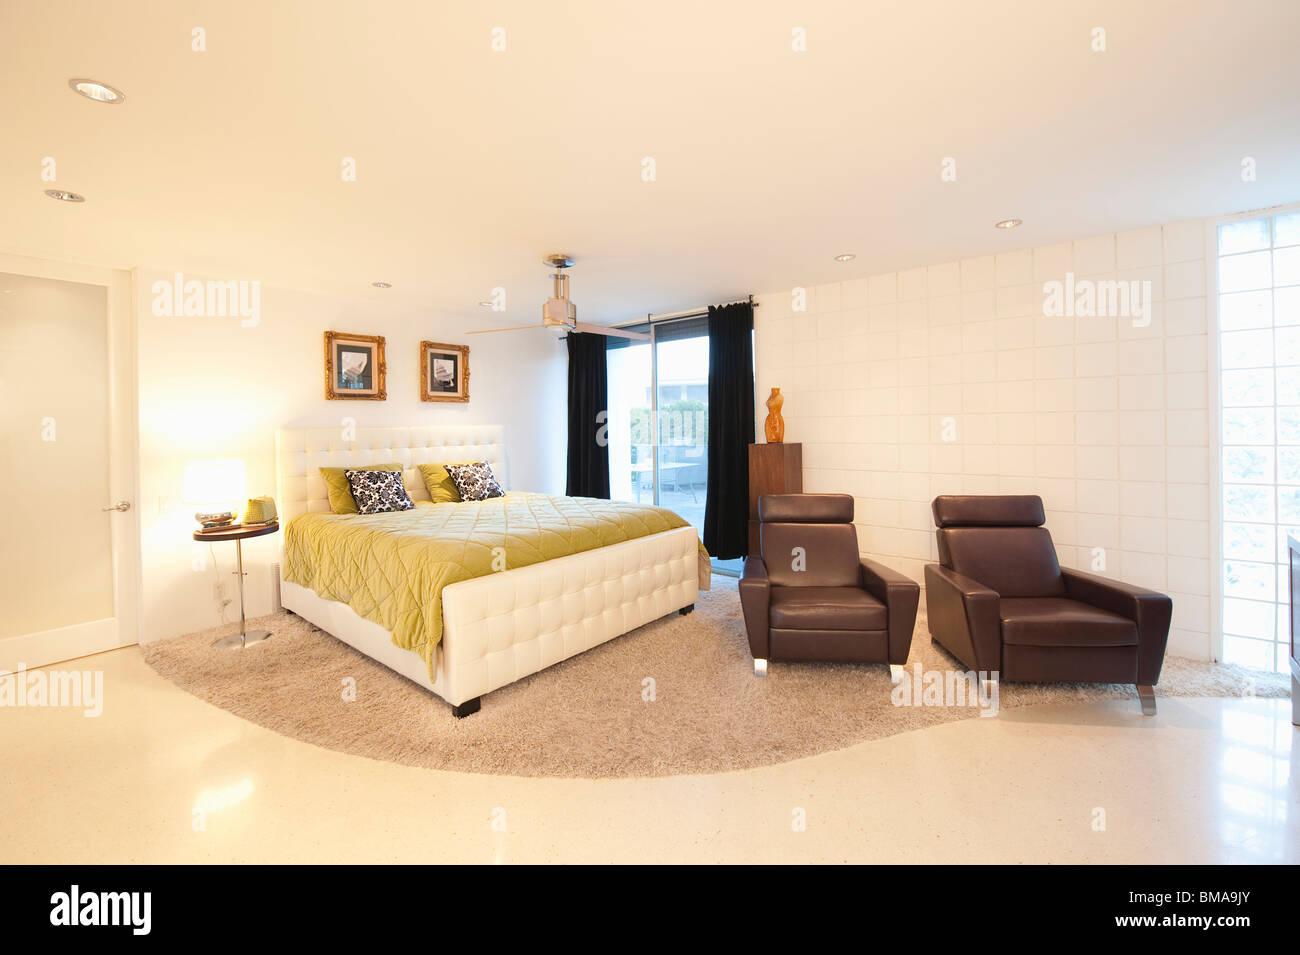 partly stockfotos partly bilder alamy. Black Bedroom Furniture Sets. Home Design Ideas